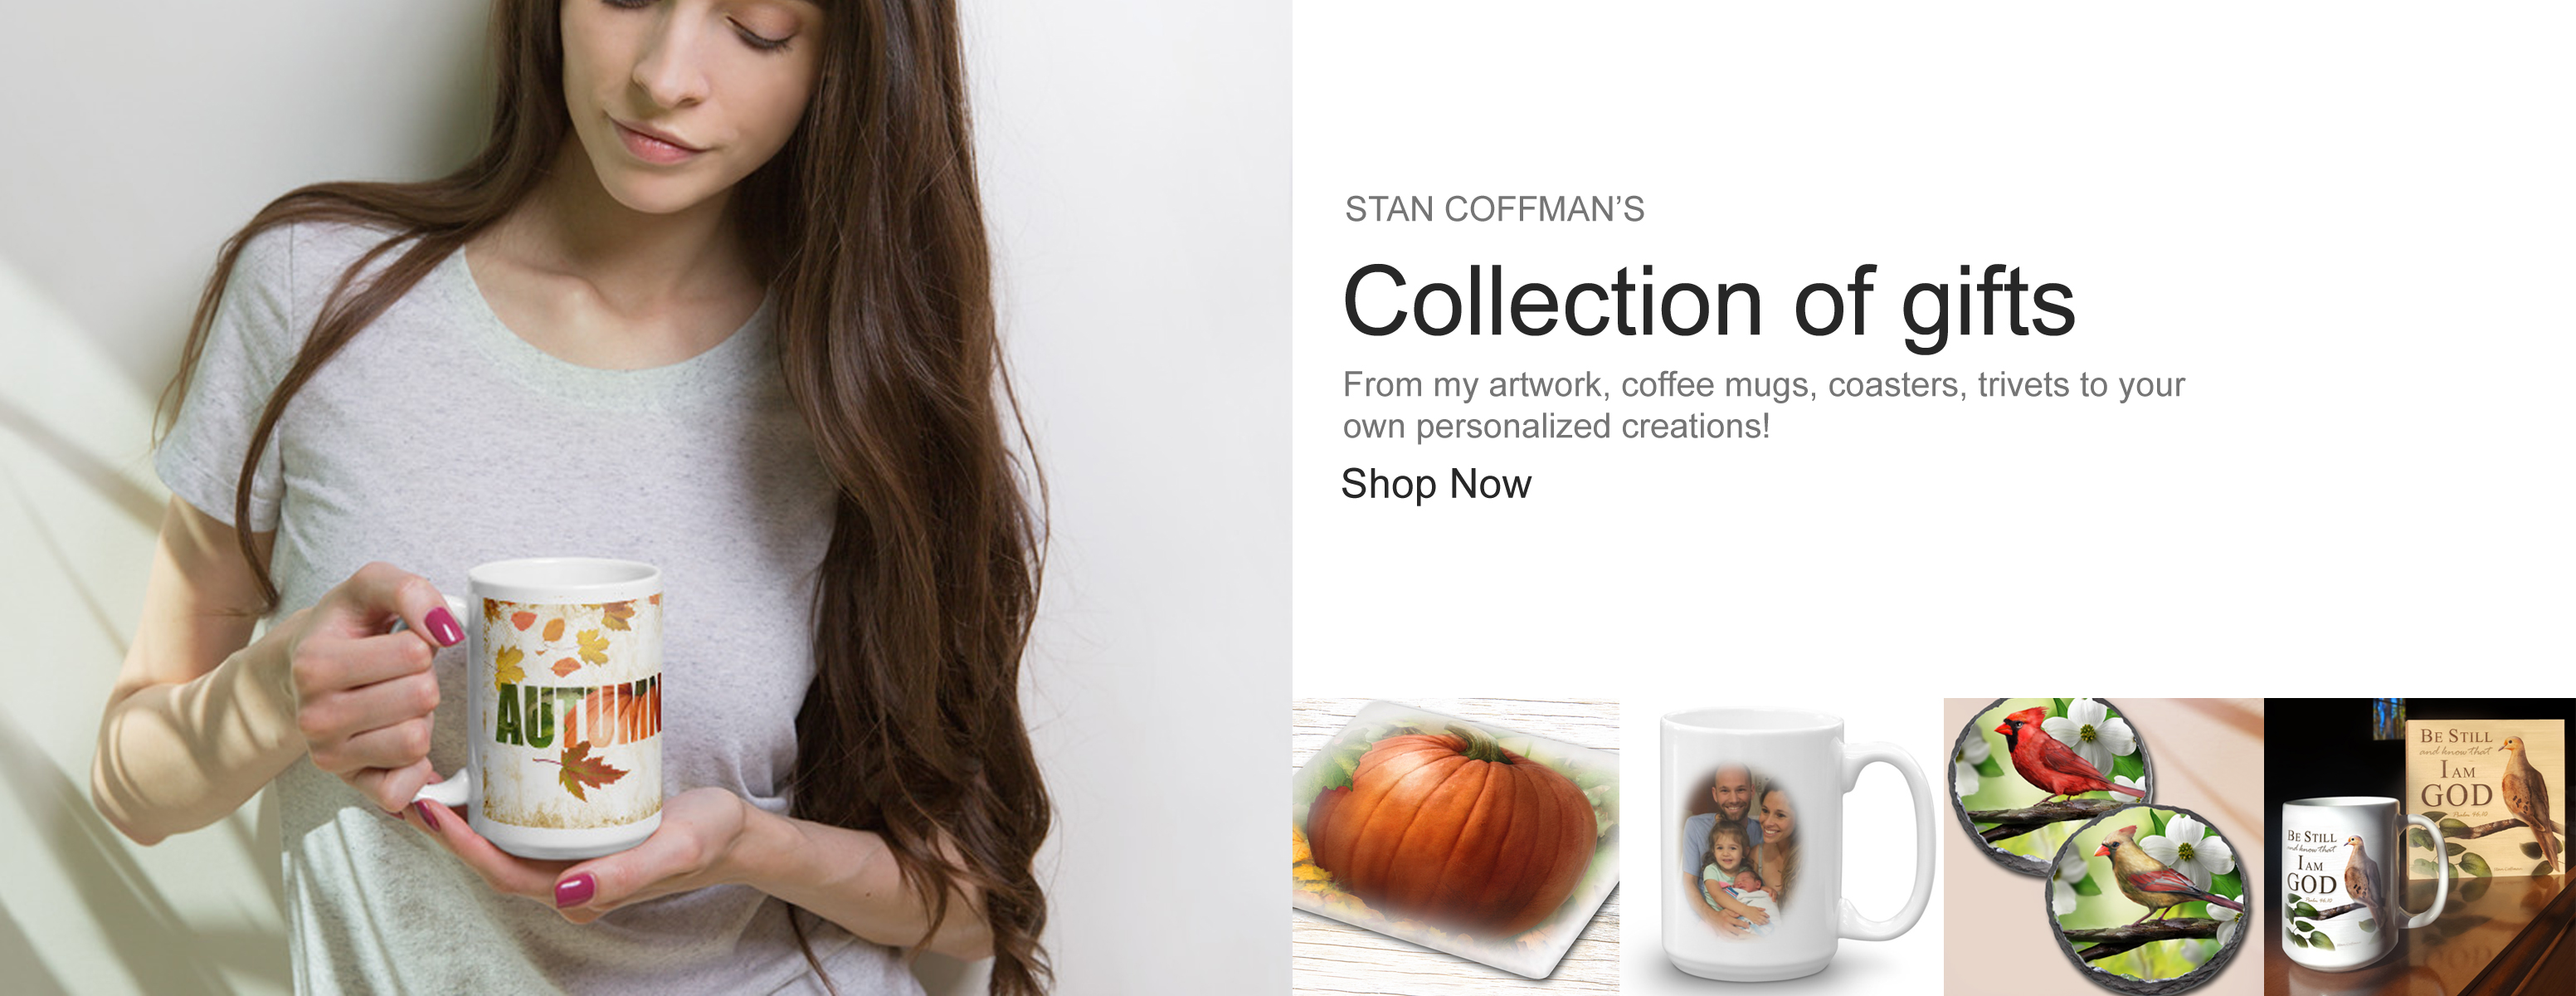 stan-coffman-banner-v1.jpg